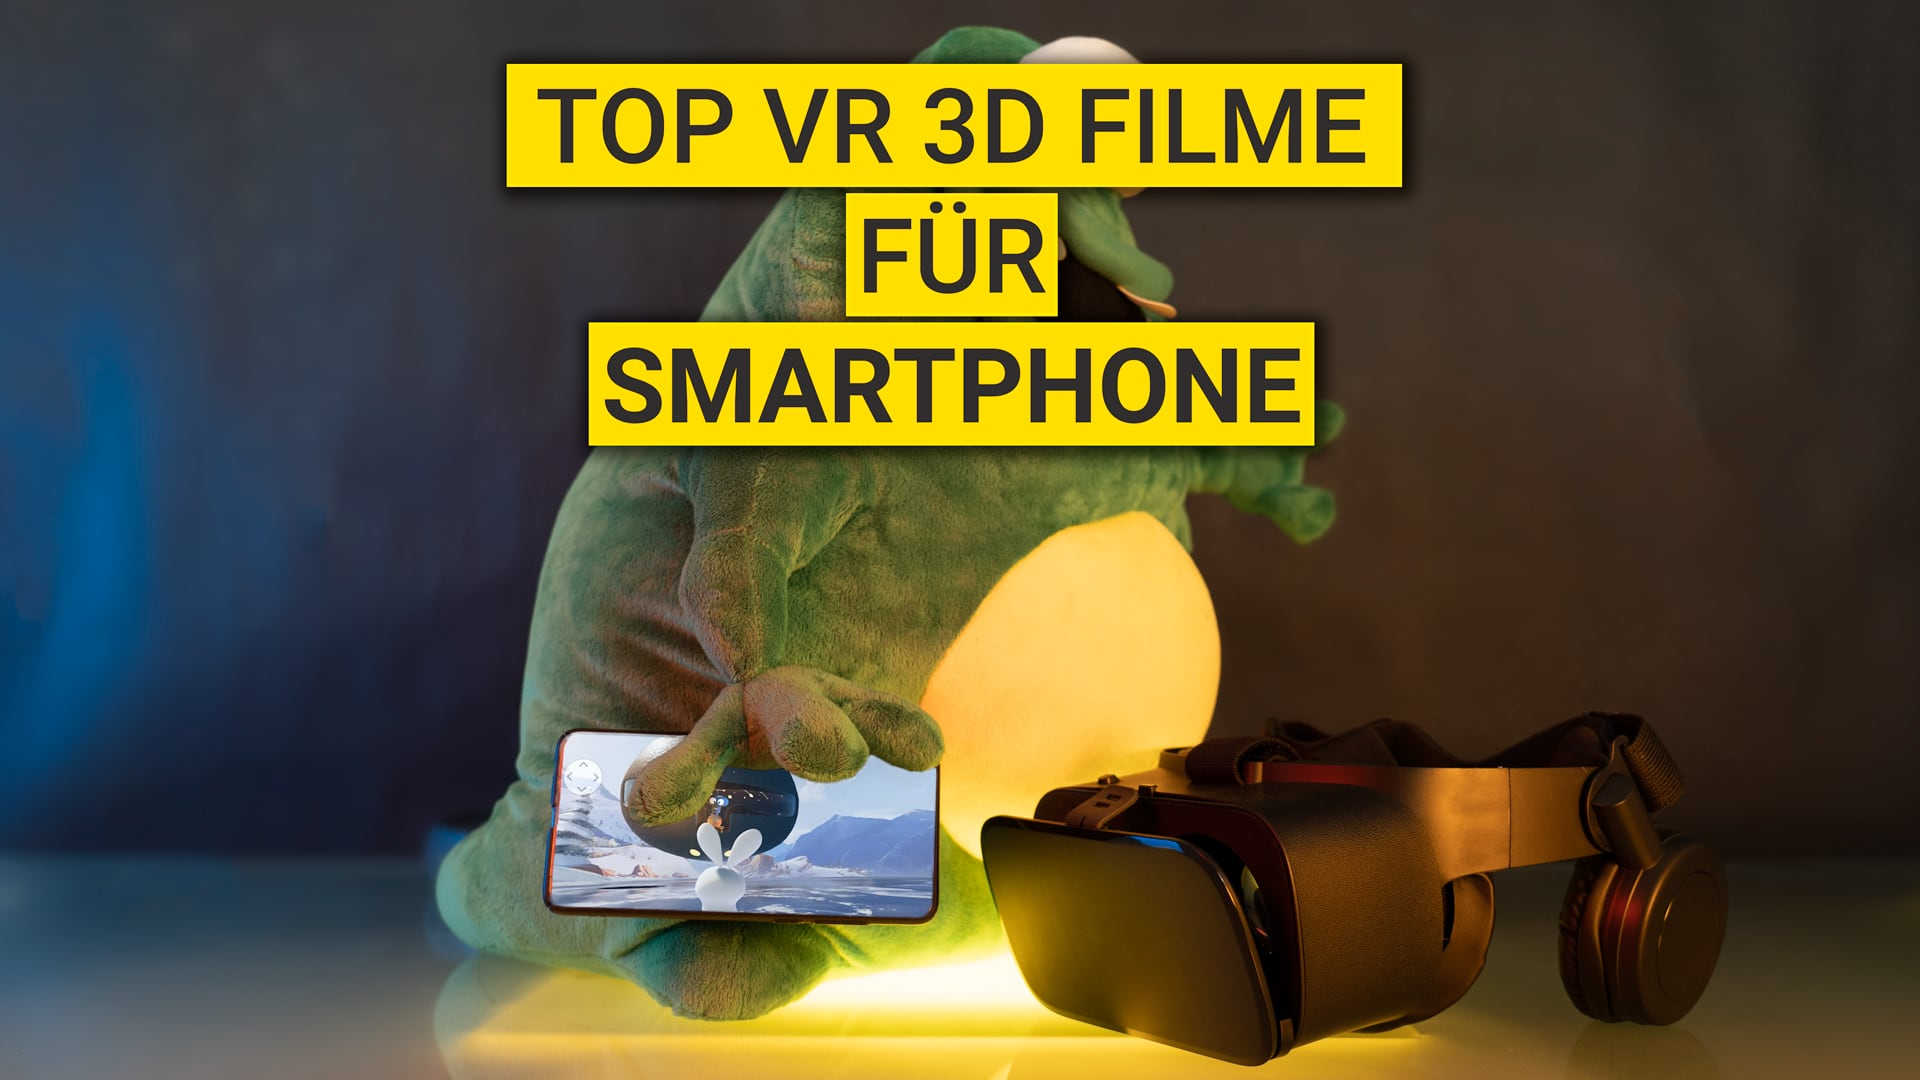 Top VR 3D Filme für Smartphone